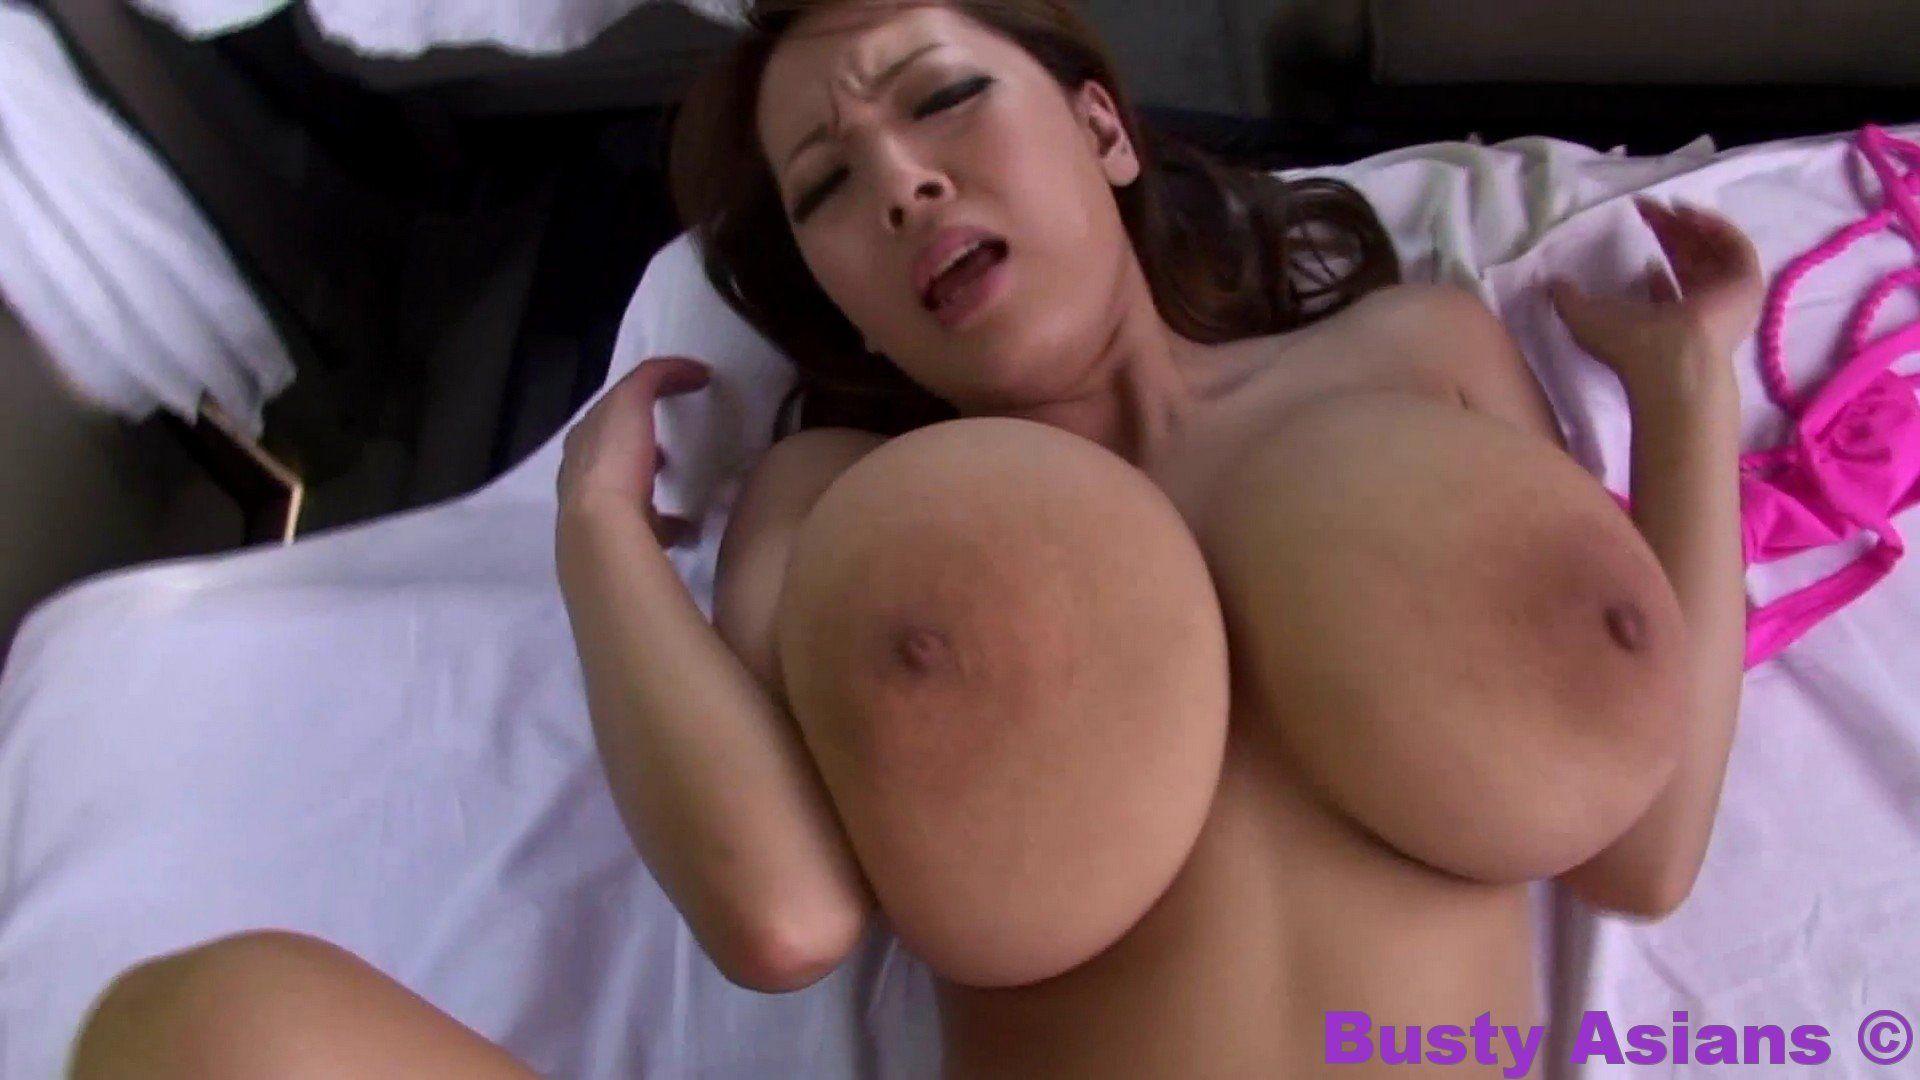 cam girl multiple orgasms